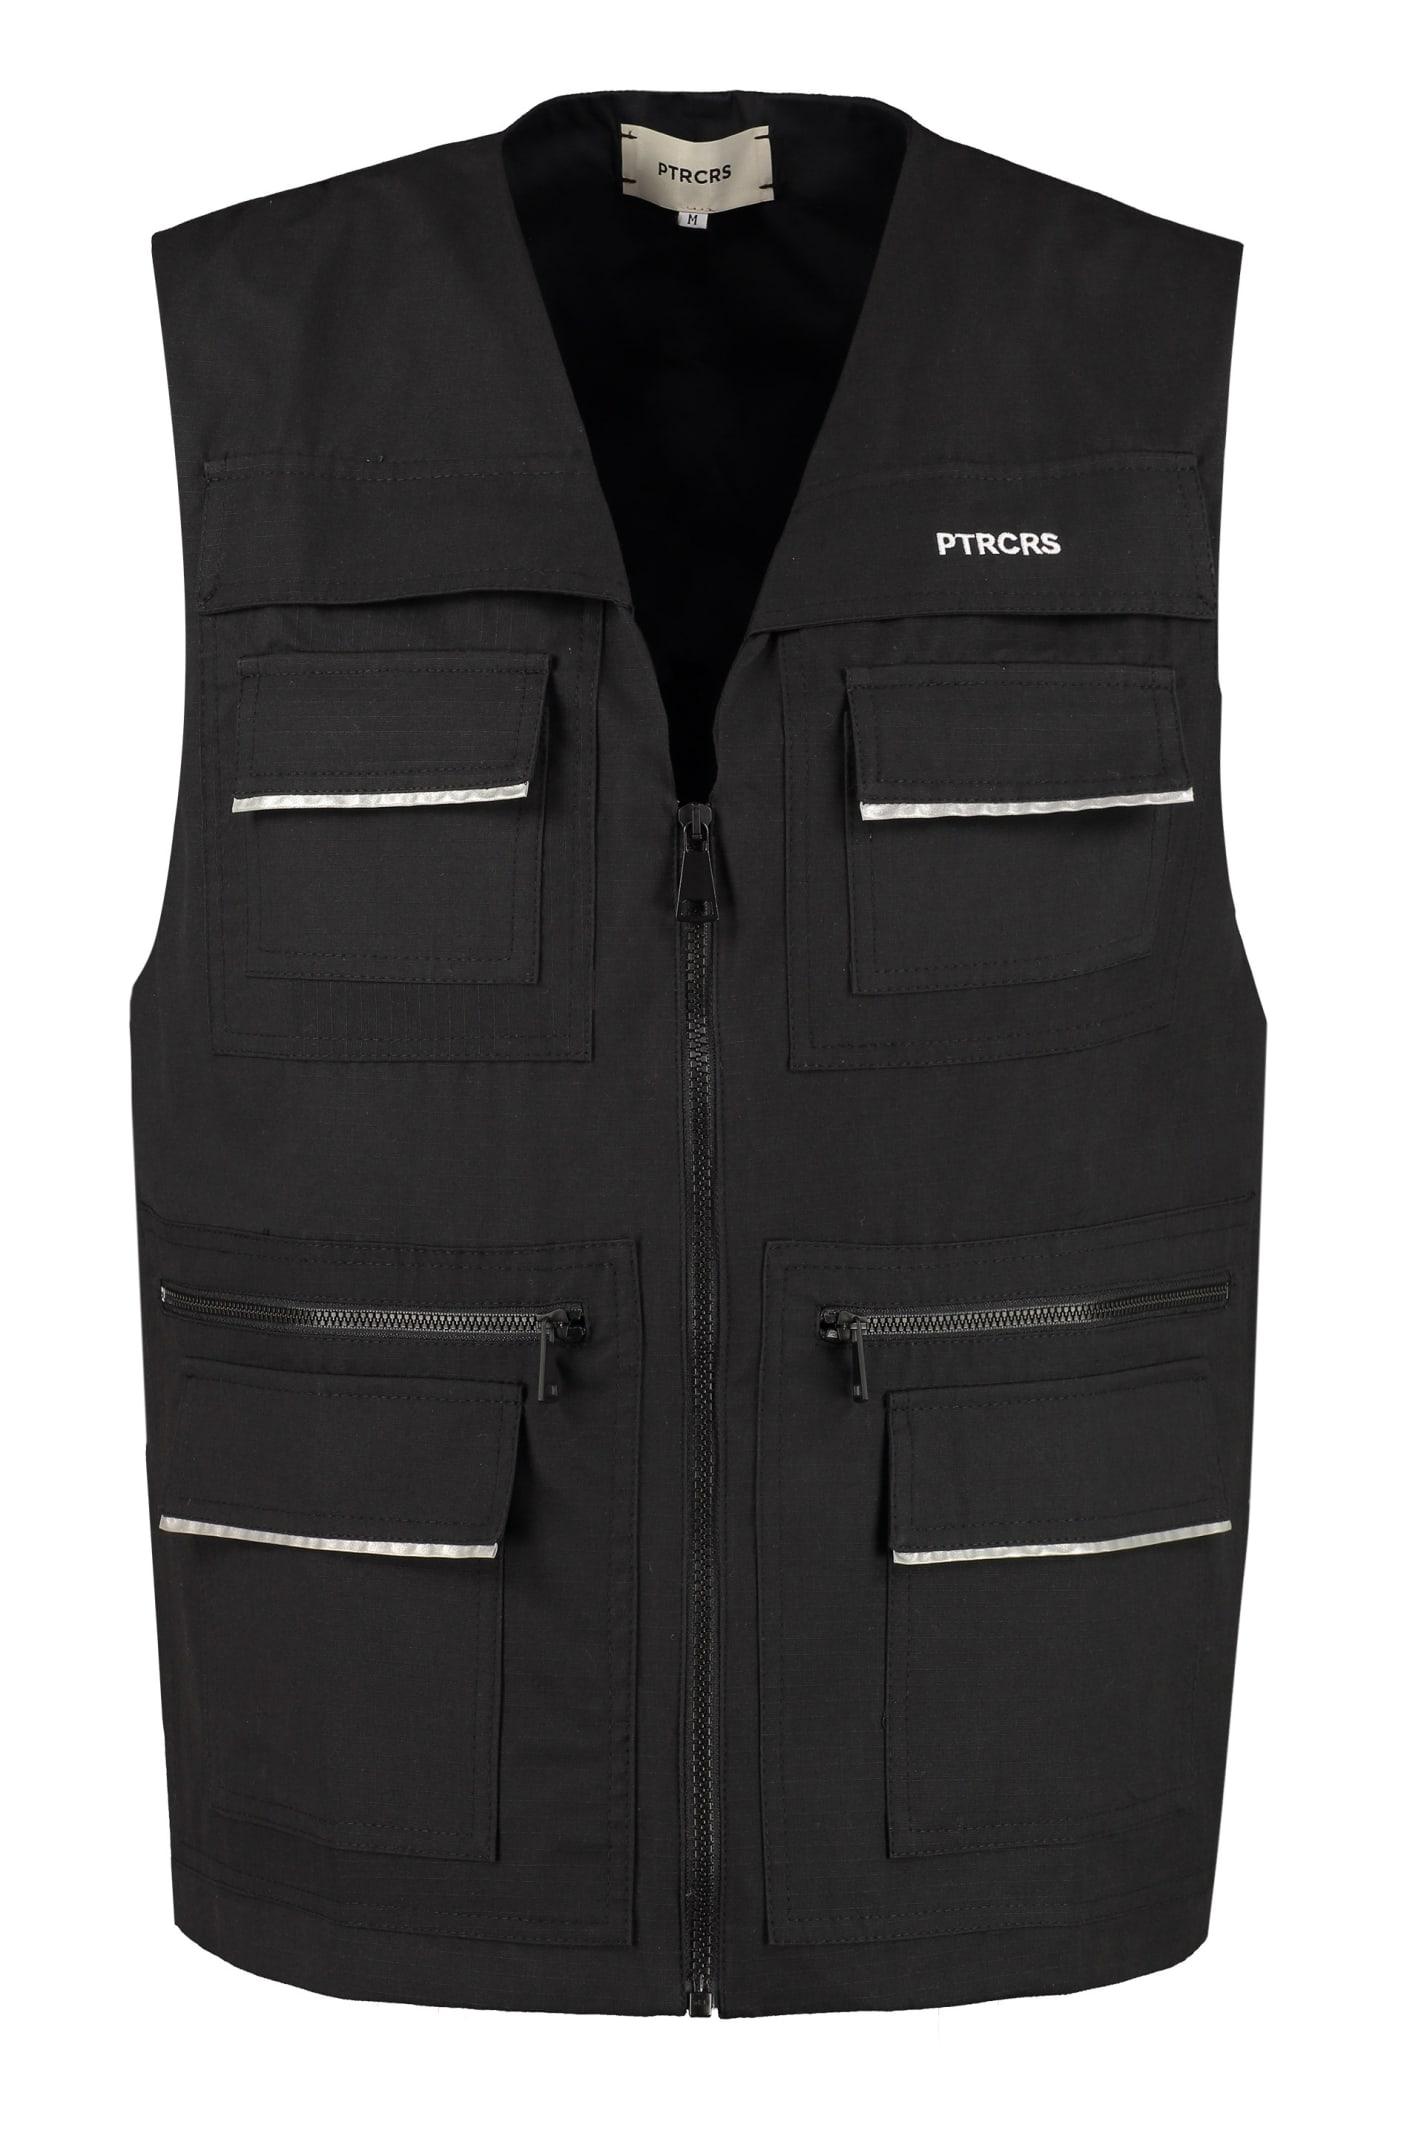 PTRCRS by Christian Petrini Cotton Multi-pocket Vest